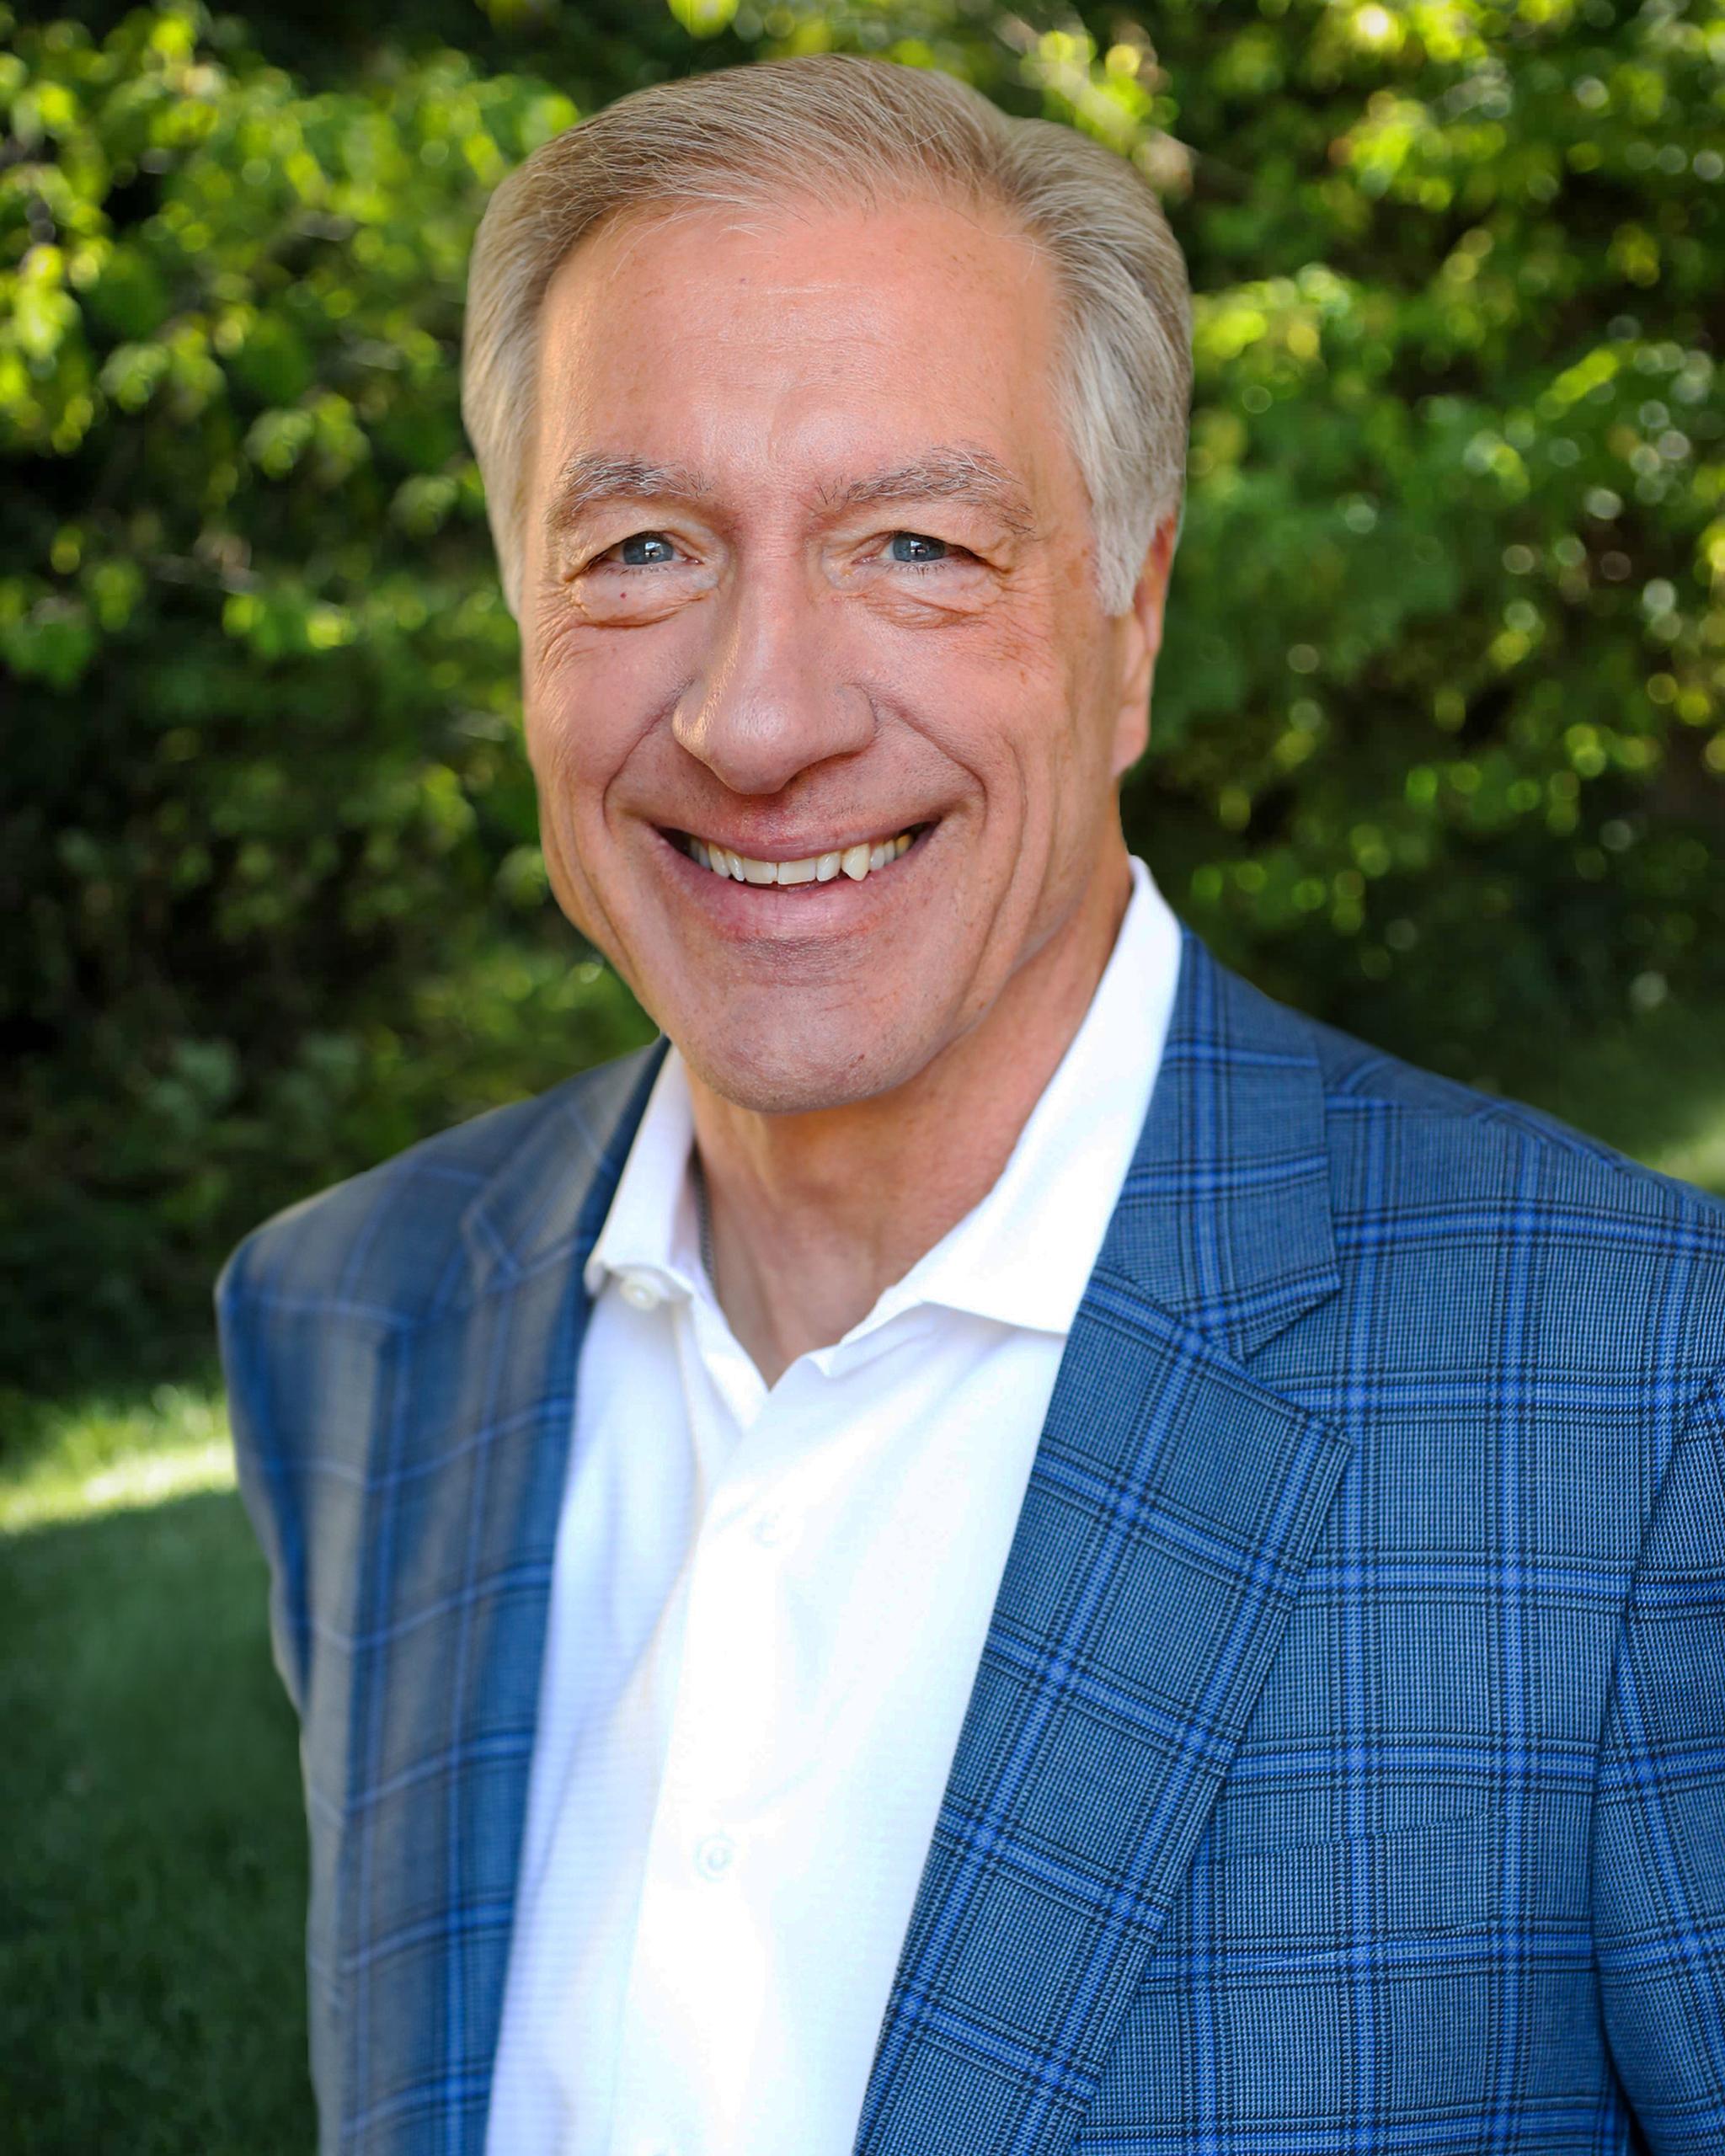 Martin F. Leifeld